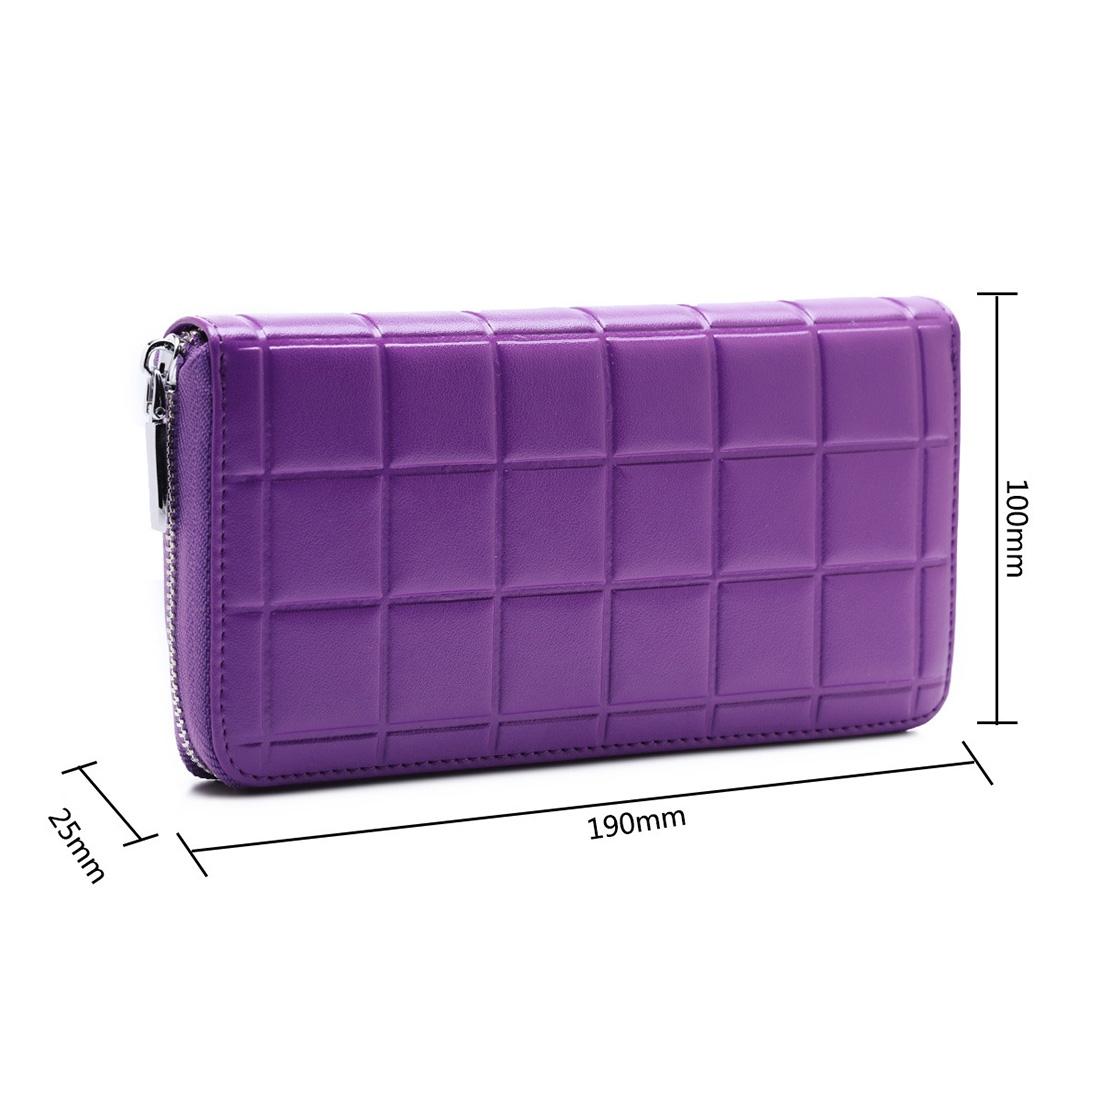 903 Antimagnetic RFID Female Large Capacity Casual Square Organ Card Bag/ wallet/ Clutch Bag (Purple)